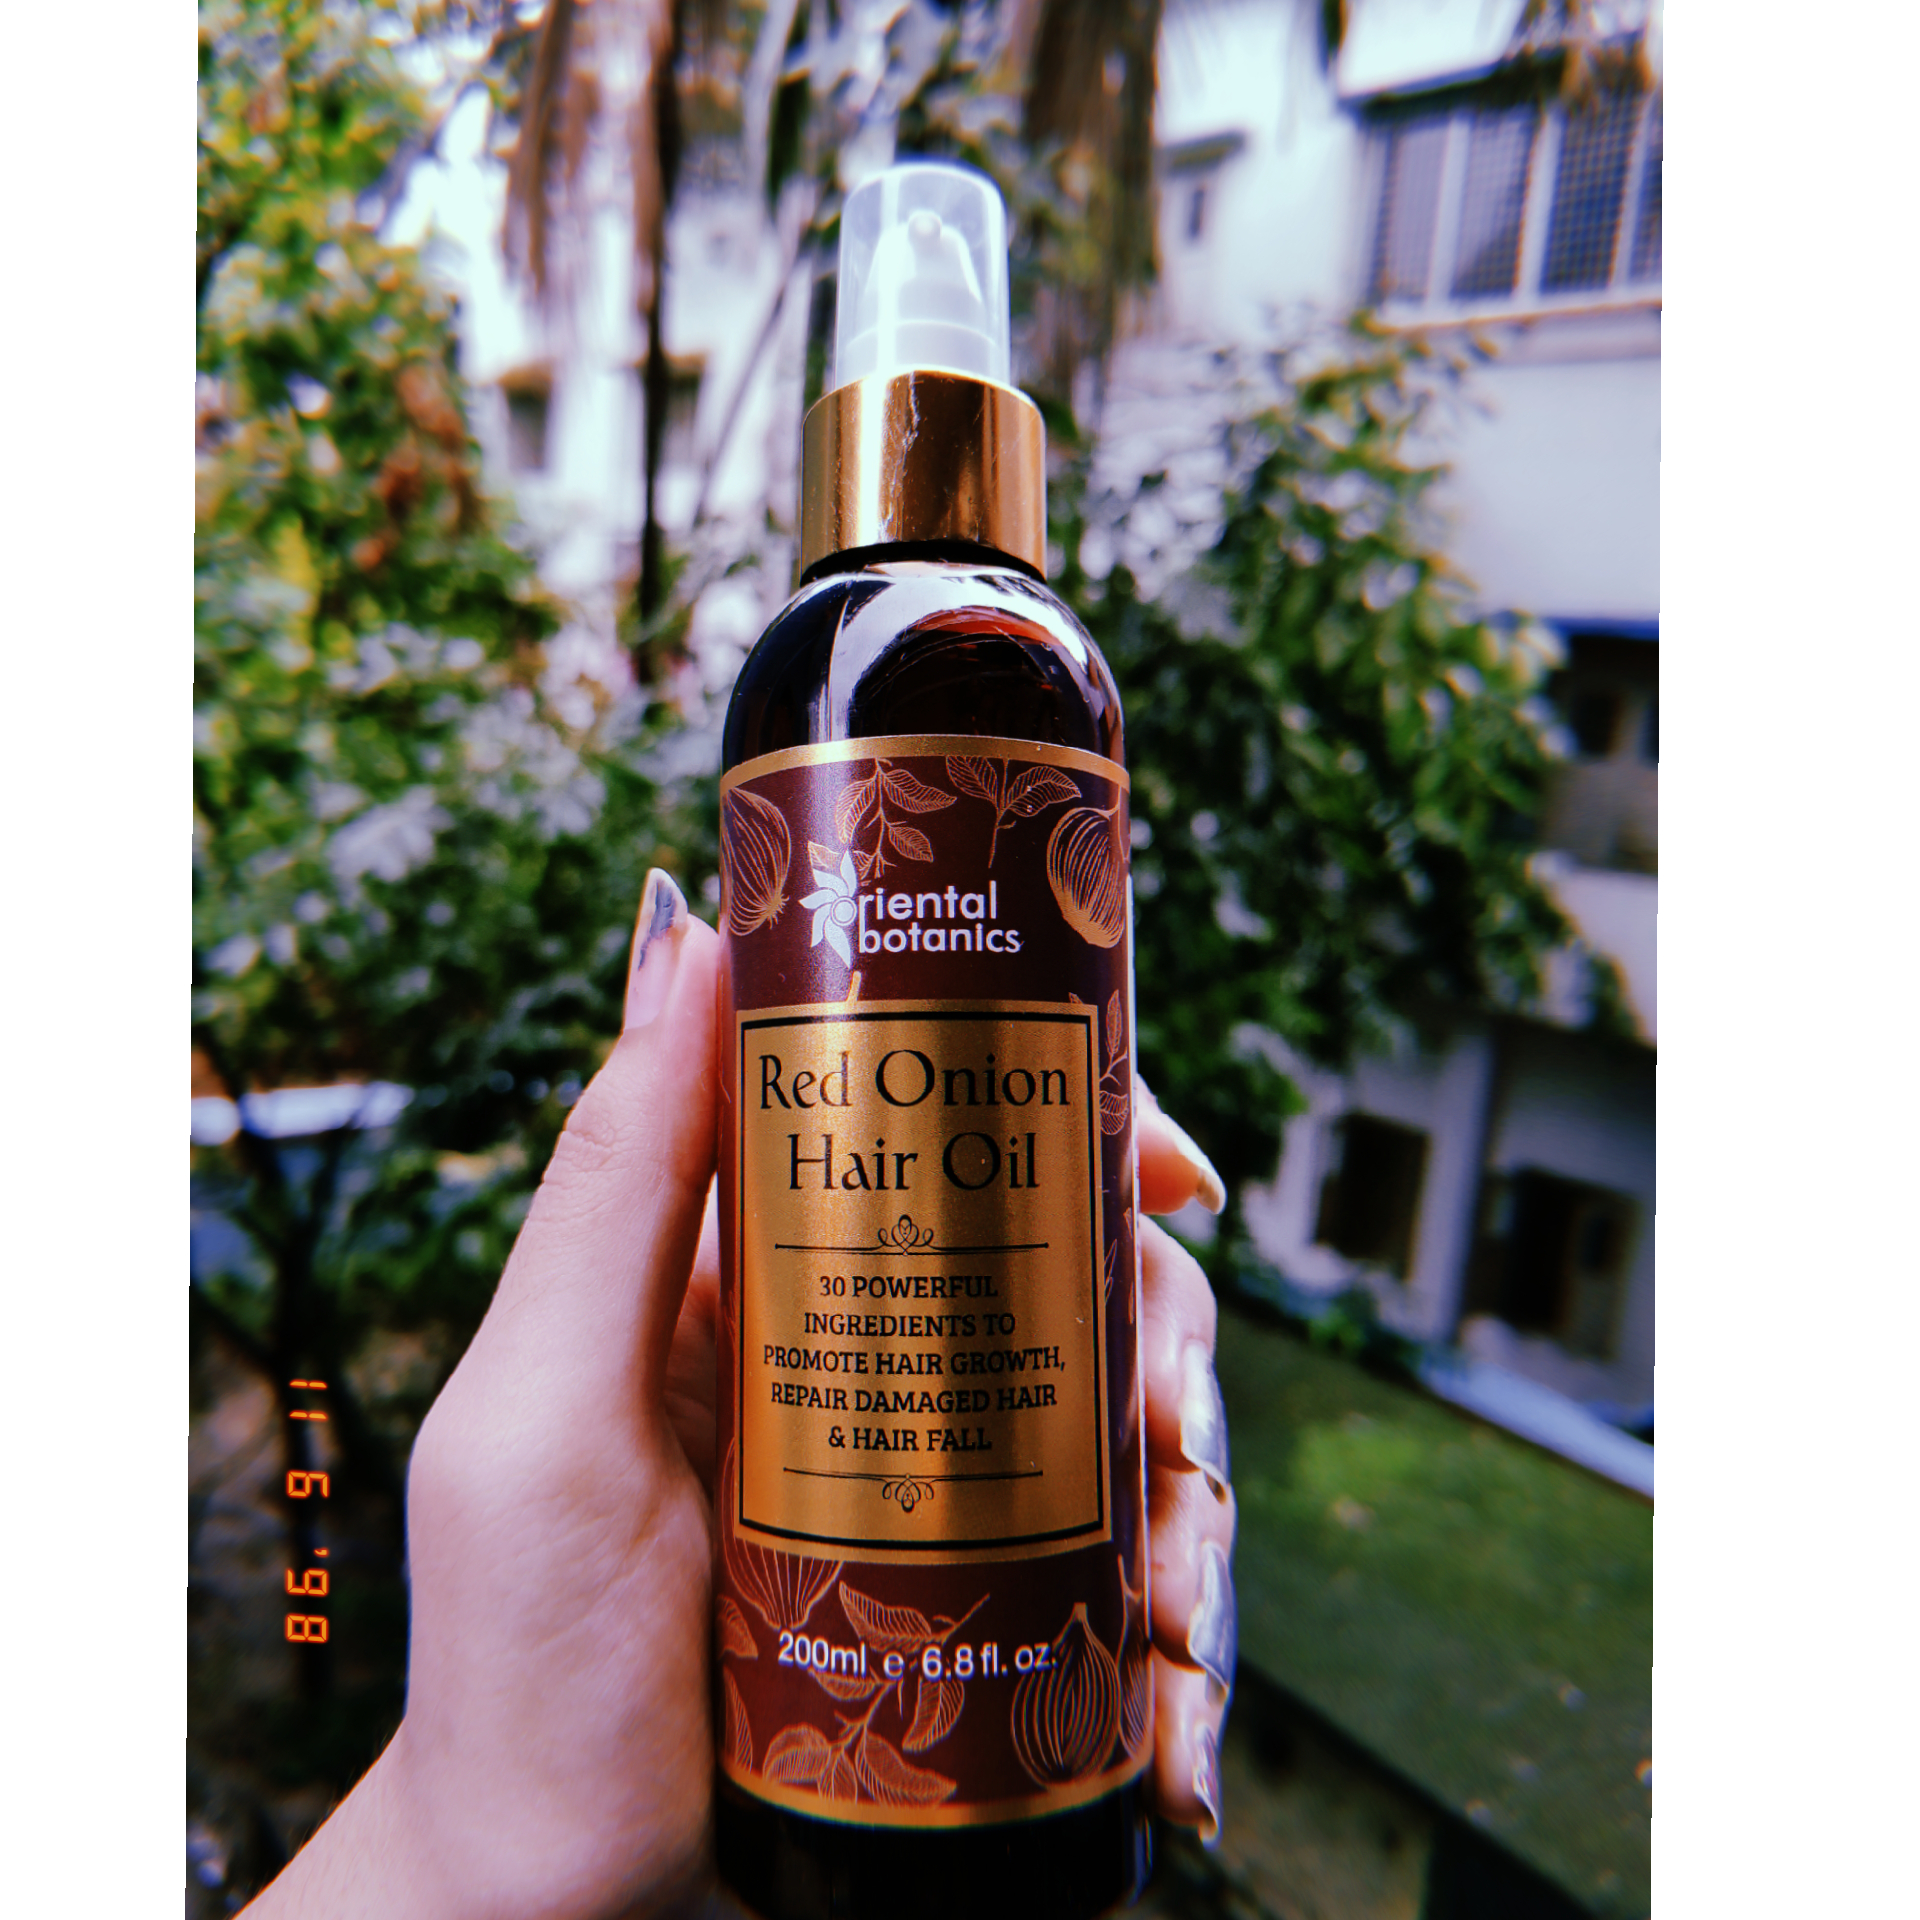 Oriental Botanics Red Onion Hair Growth Oil-Best In the Market-By shreyasi_datta